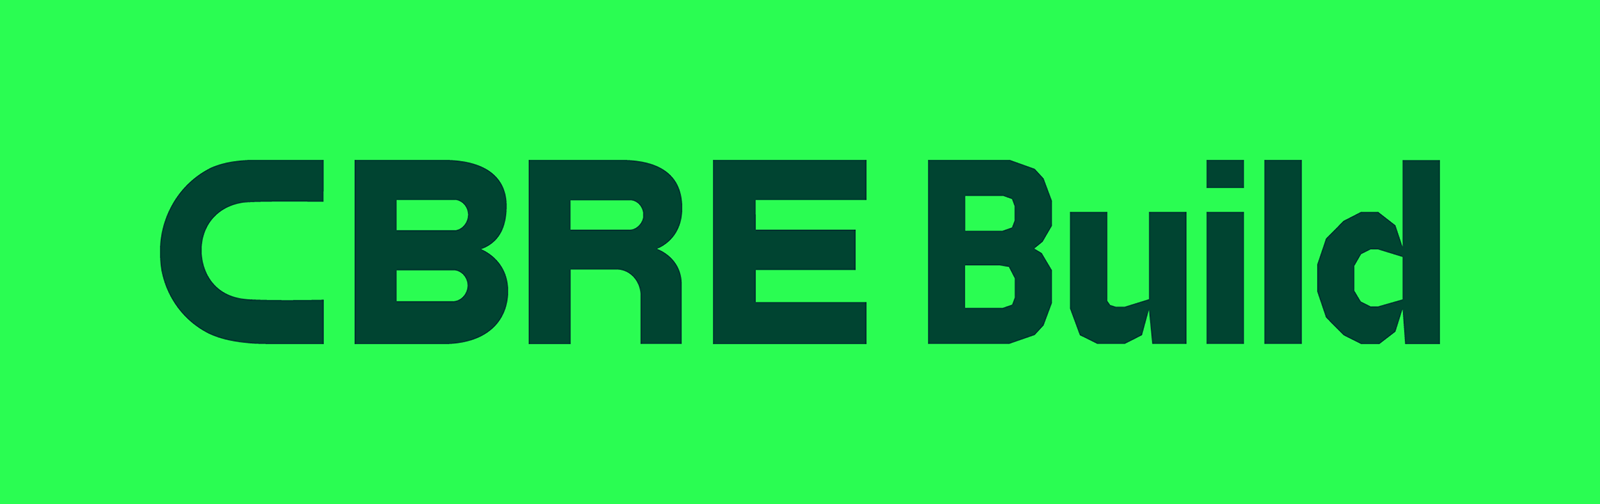 CBRE Build品牌啟動全新的LOGO和視覺VI形象-深圳VI設計